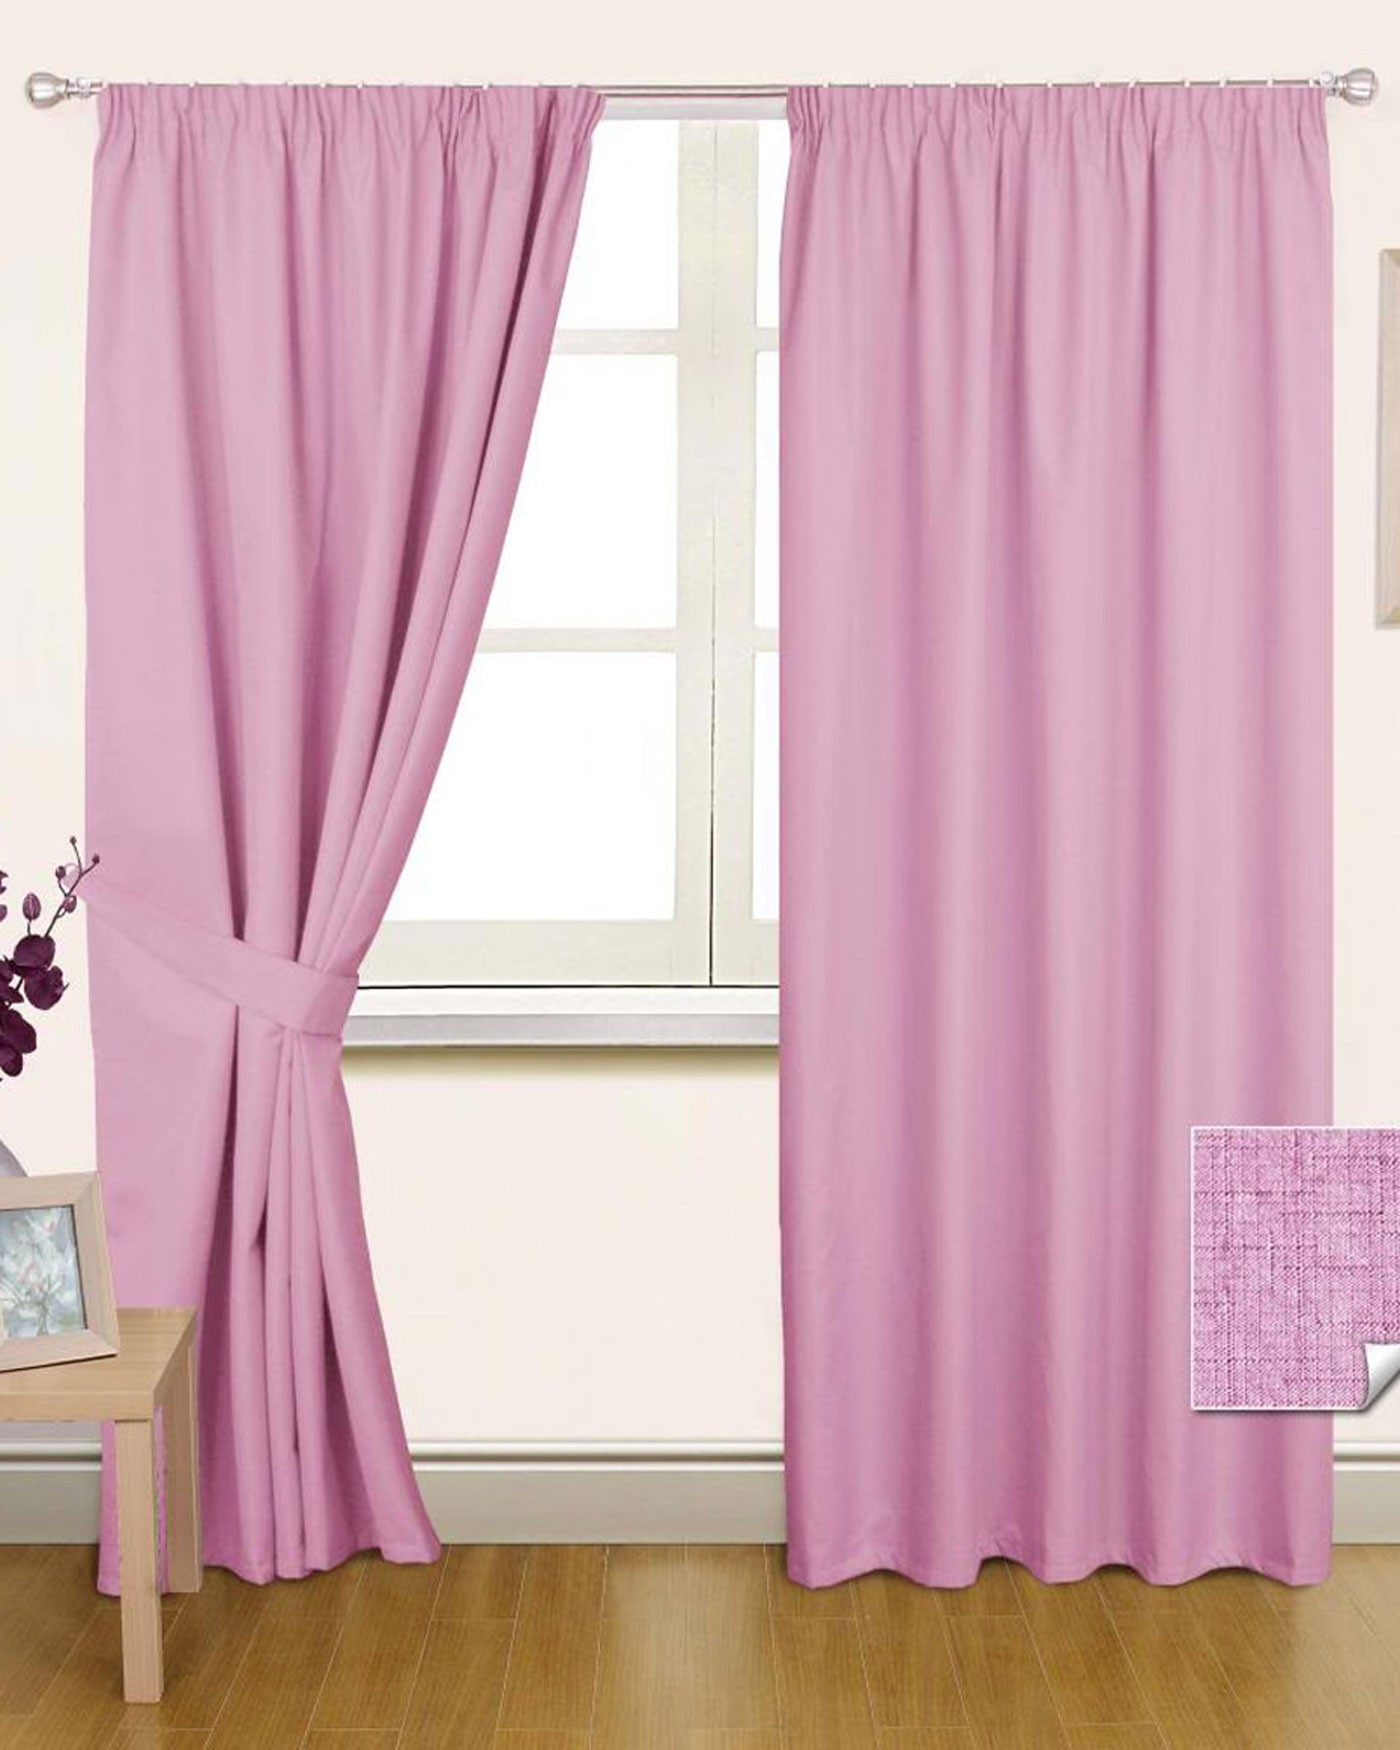 Pink Pencil Pleat Blackout Curtain Pair Homescapes Inside Pencil Pleat Blackout Curtains (Image 8 of 15)